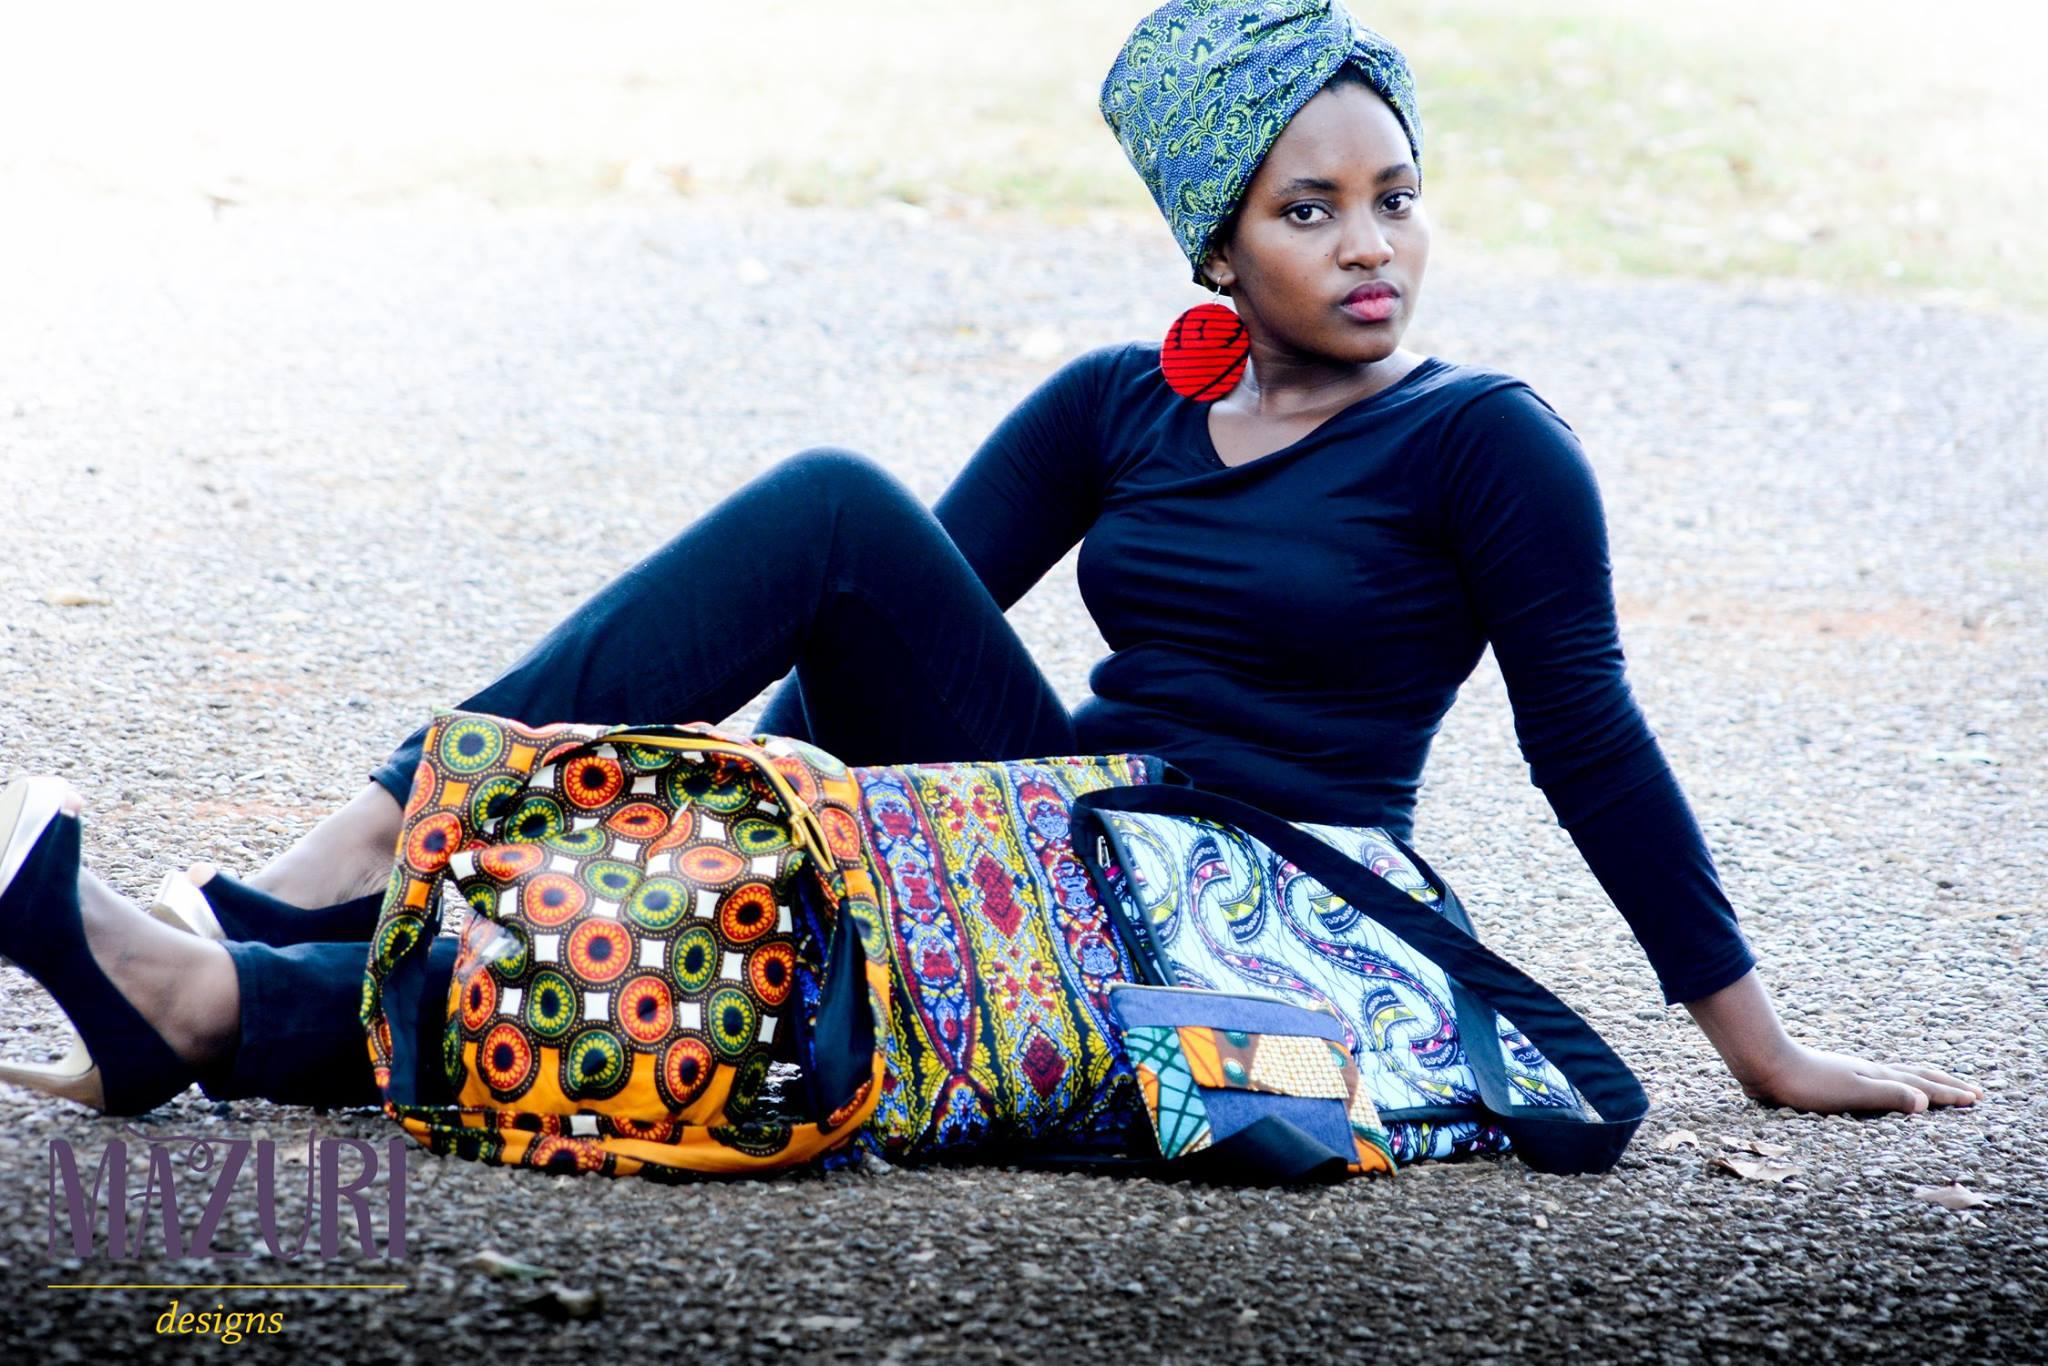 Mazuri Designs fair trade clothing.jpg